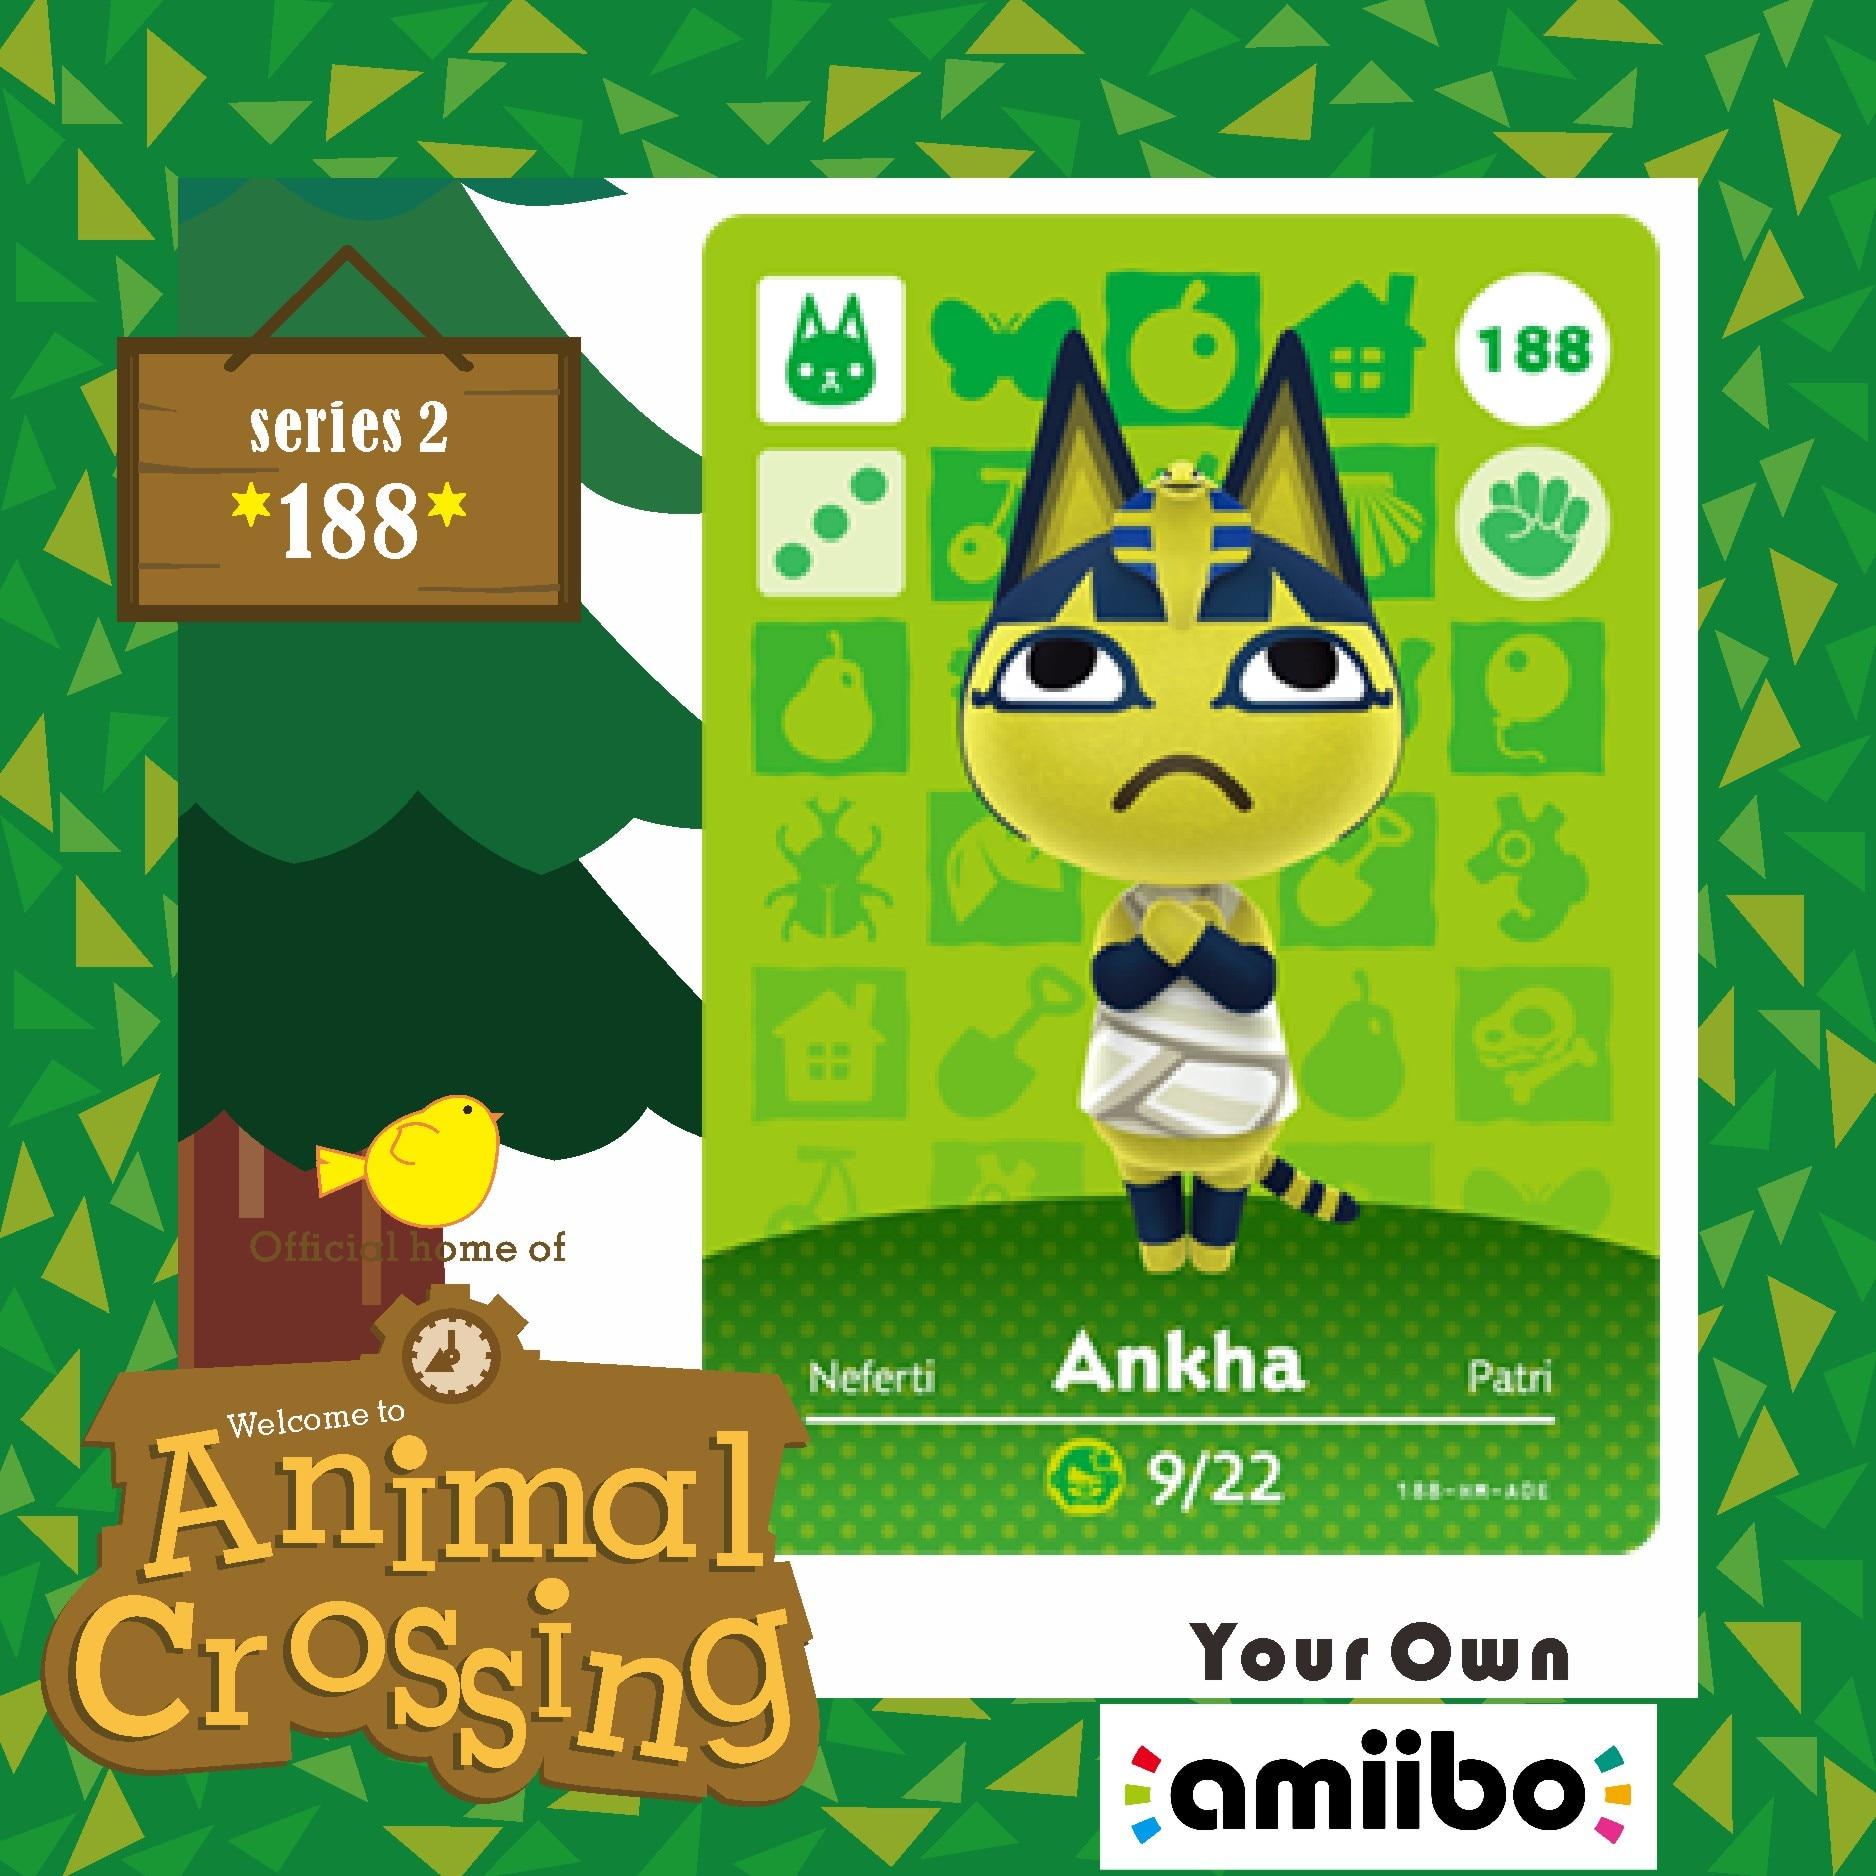 Amiibo Ankha Animal Crossing Ankha Animal Crossing Amiibo Ankha Amiibo Animal Crossing Ankha Villager Card Season Series 2 188